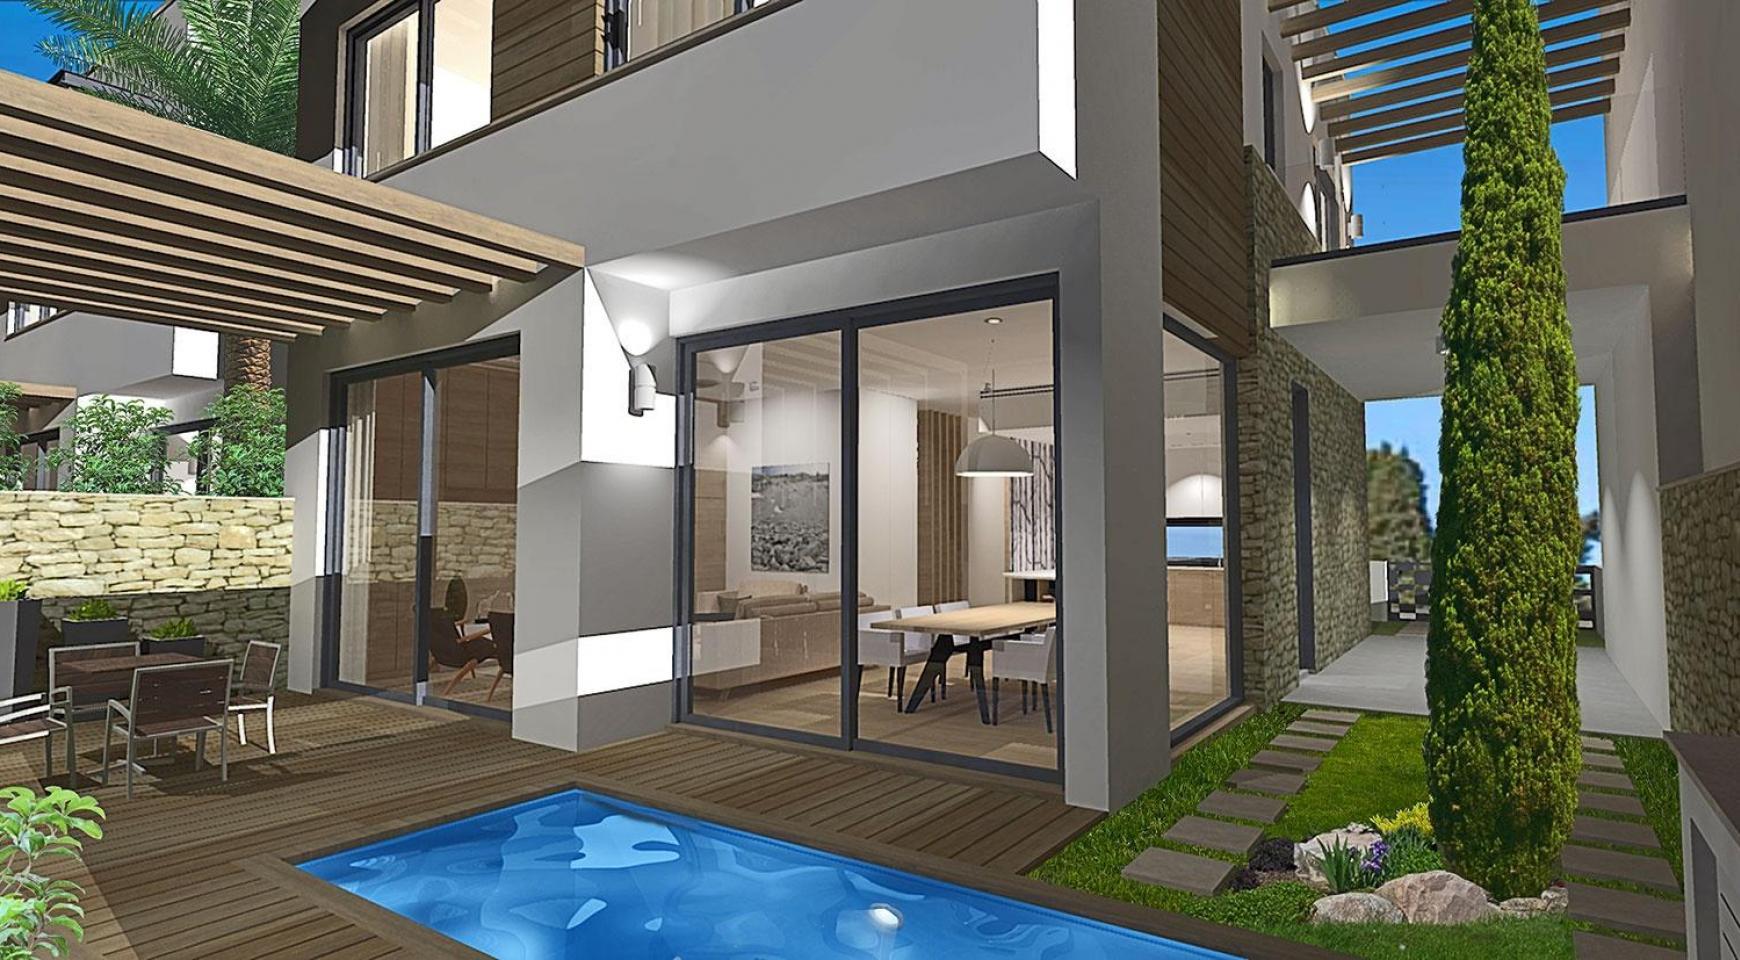 Spacious 4 Bedroom Villa in a New Complex in Agios Athanasios Area - 5